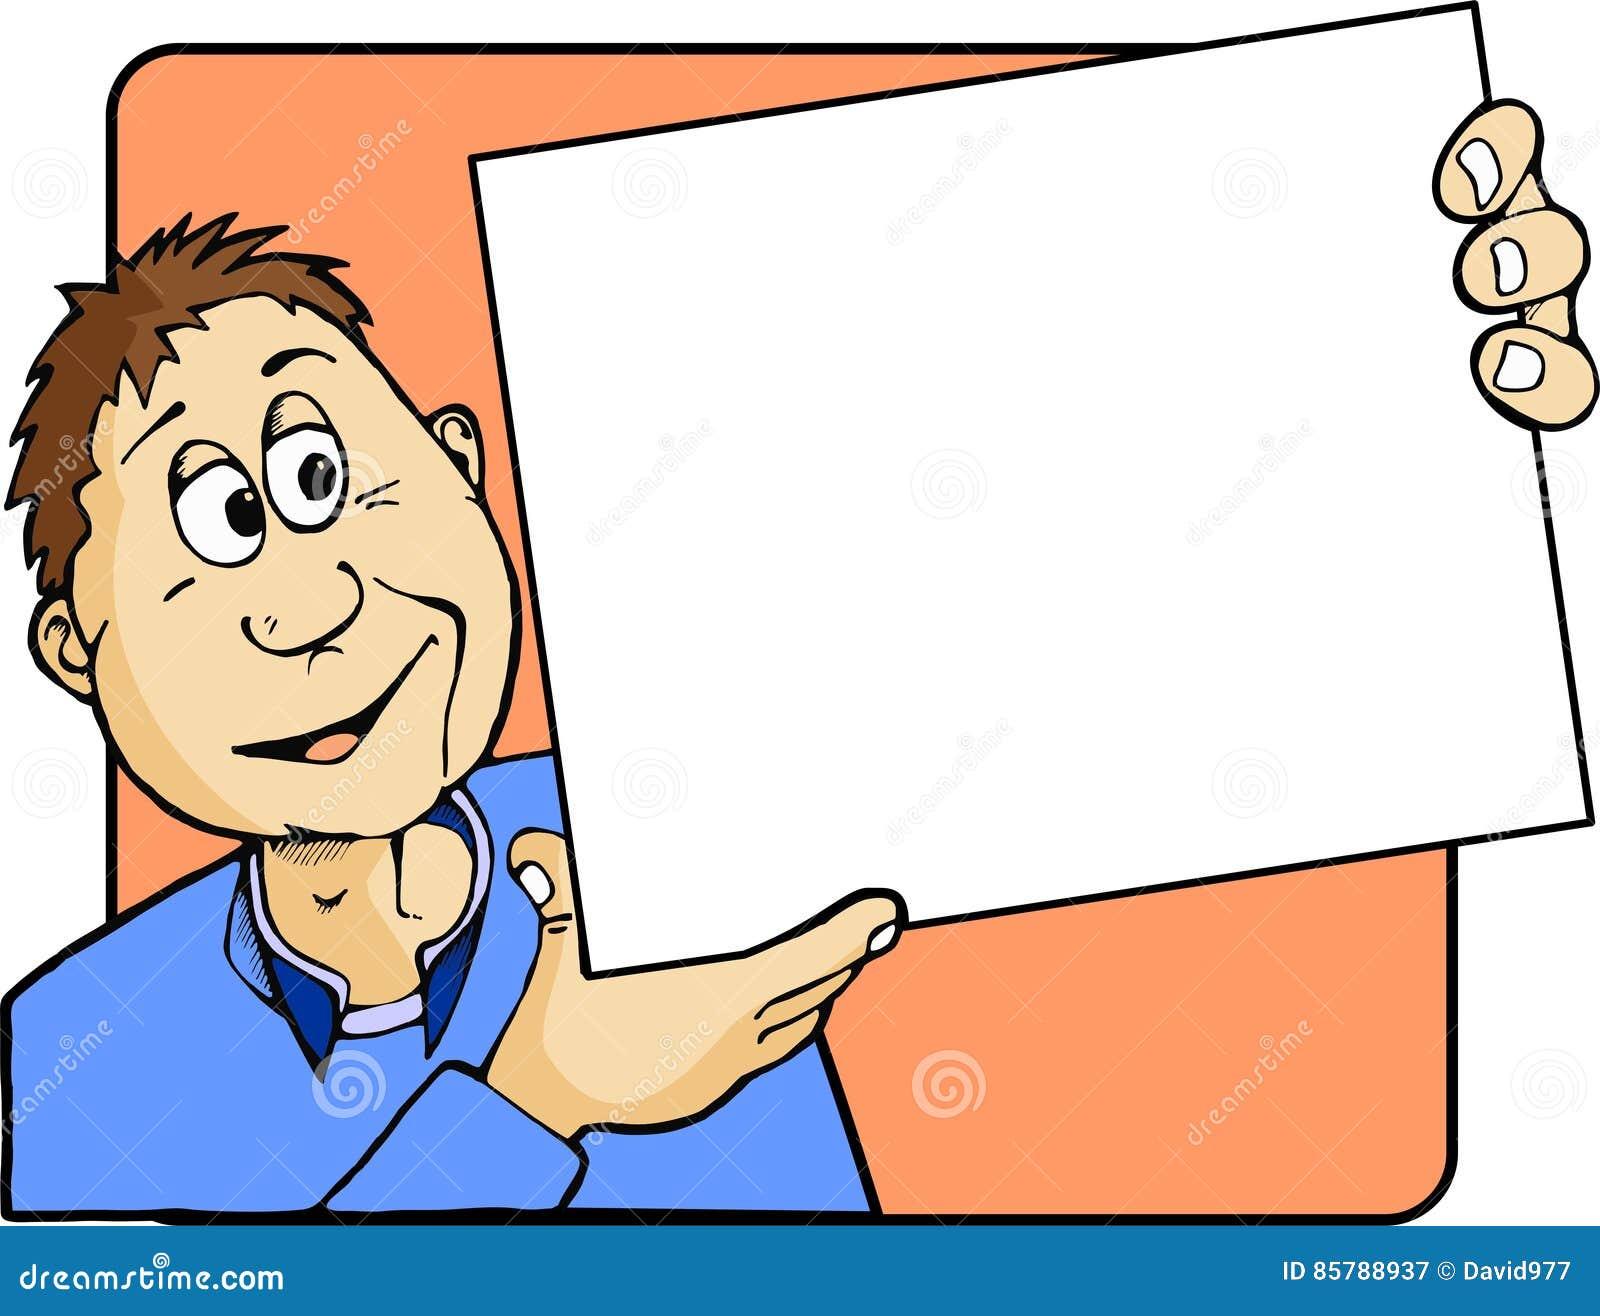 Cartoon Man Holding a Blank Notice